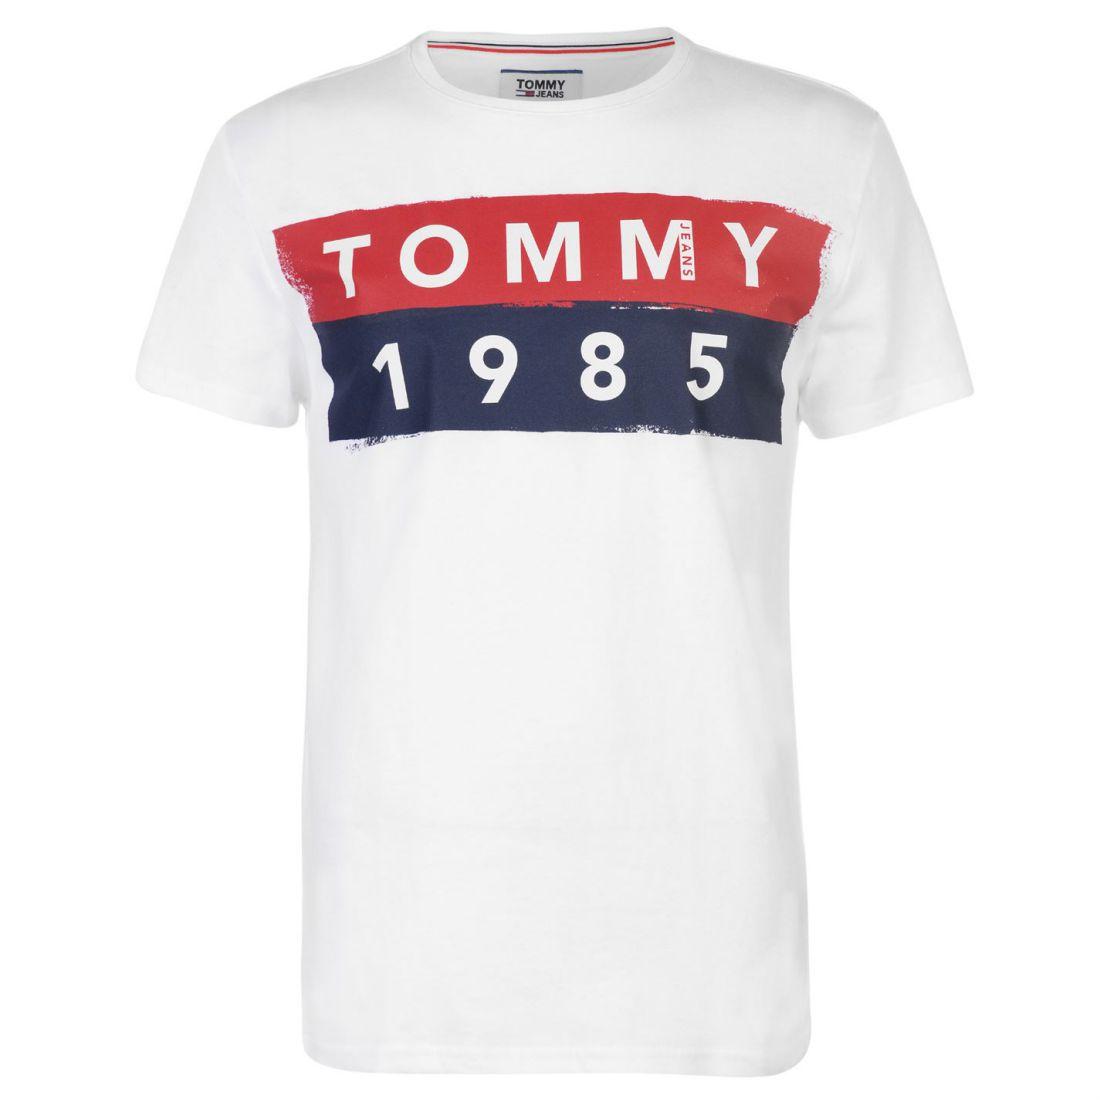 fd416649 Mens Tommy Jeans 1985 Logo T Shirt Crew Neck Short Sleeve New ...